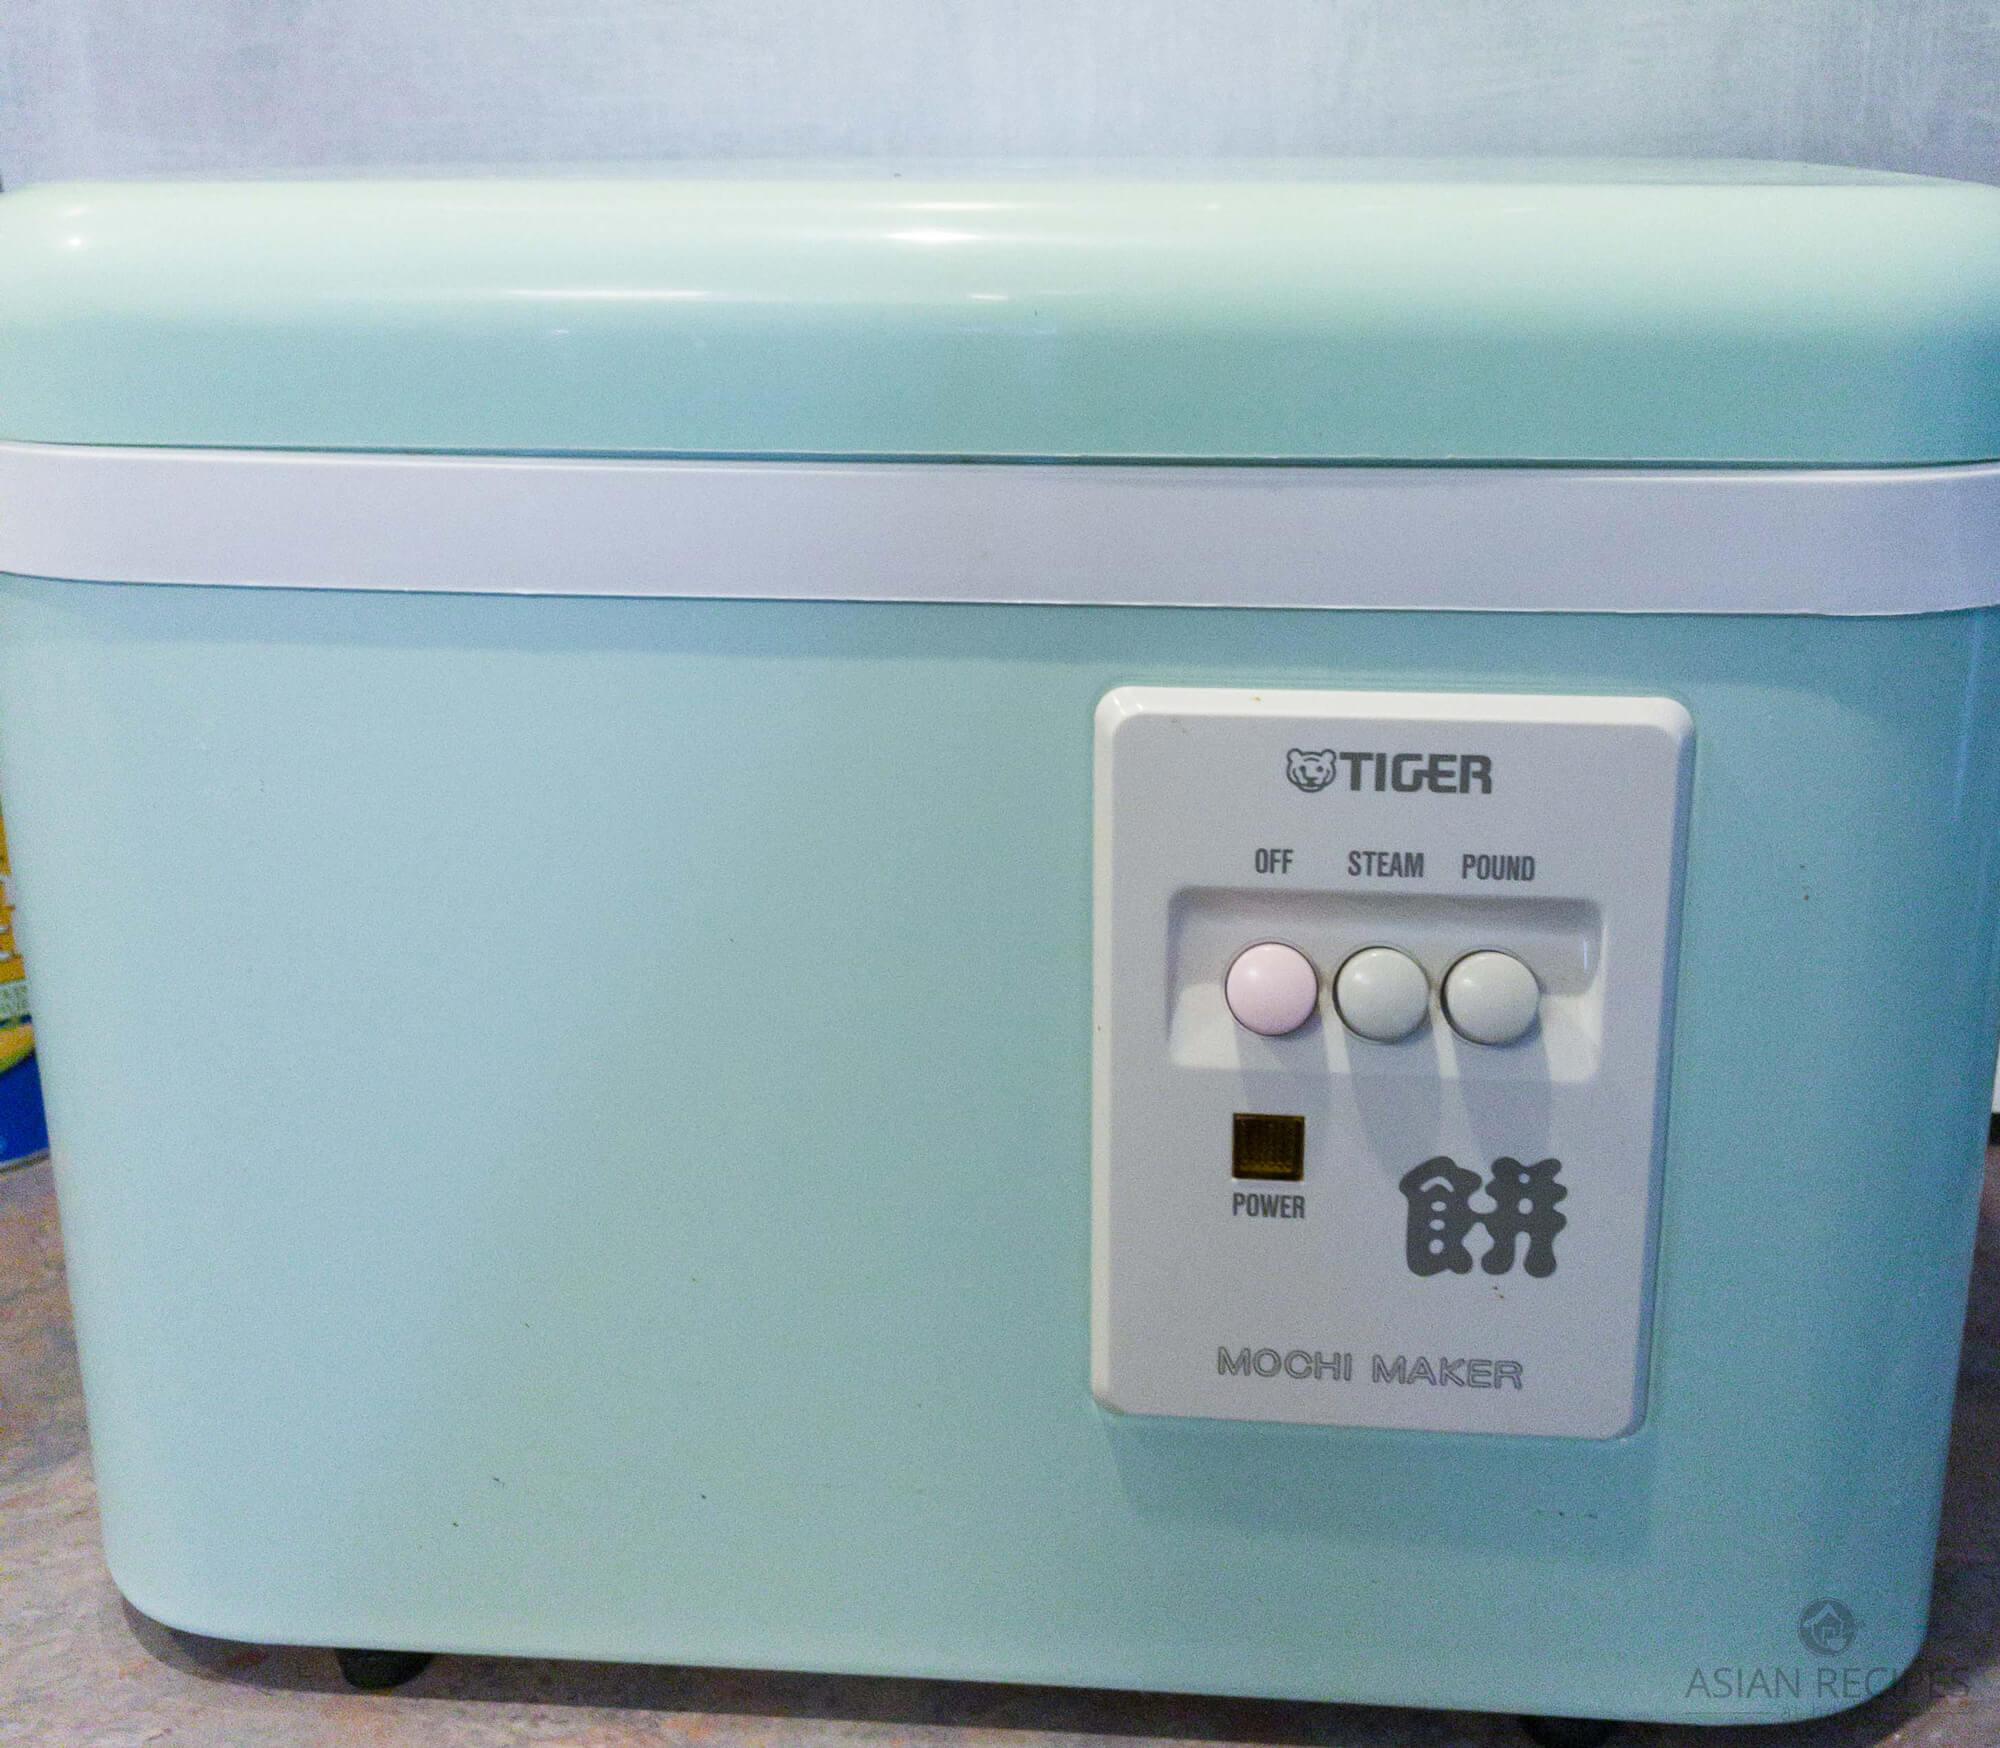 rice cake/mochi maker machine by Tiger